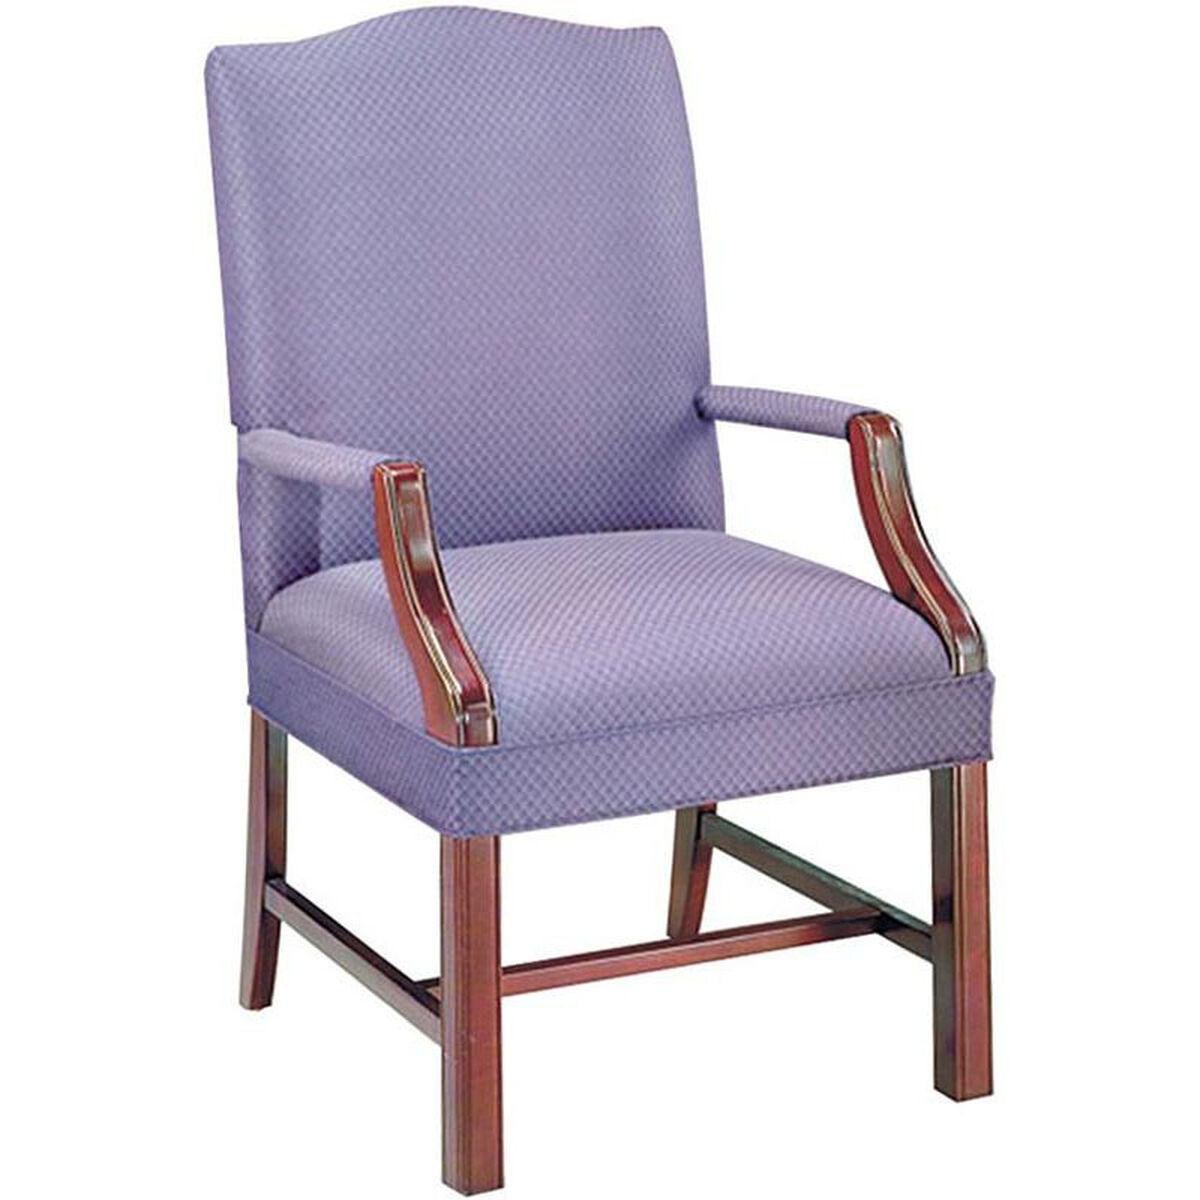 High Point Furniture Industries 3473 Hpf 3473